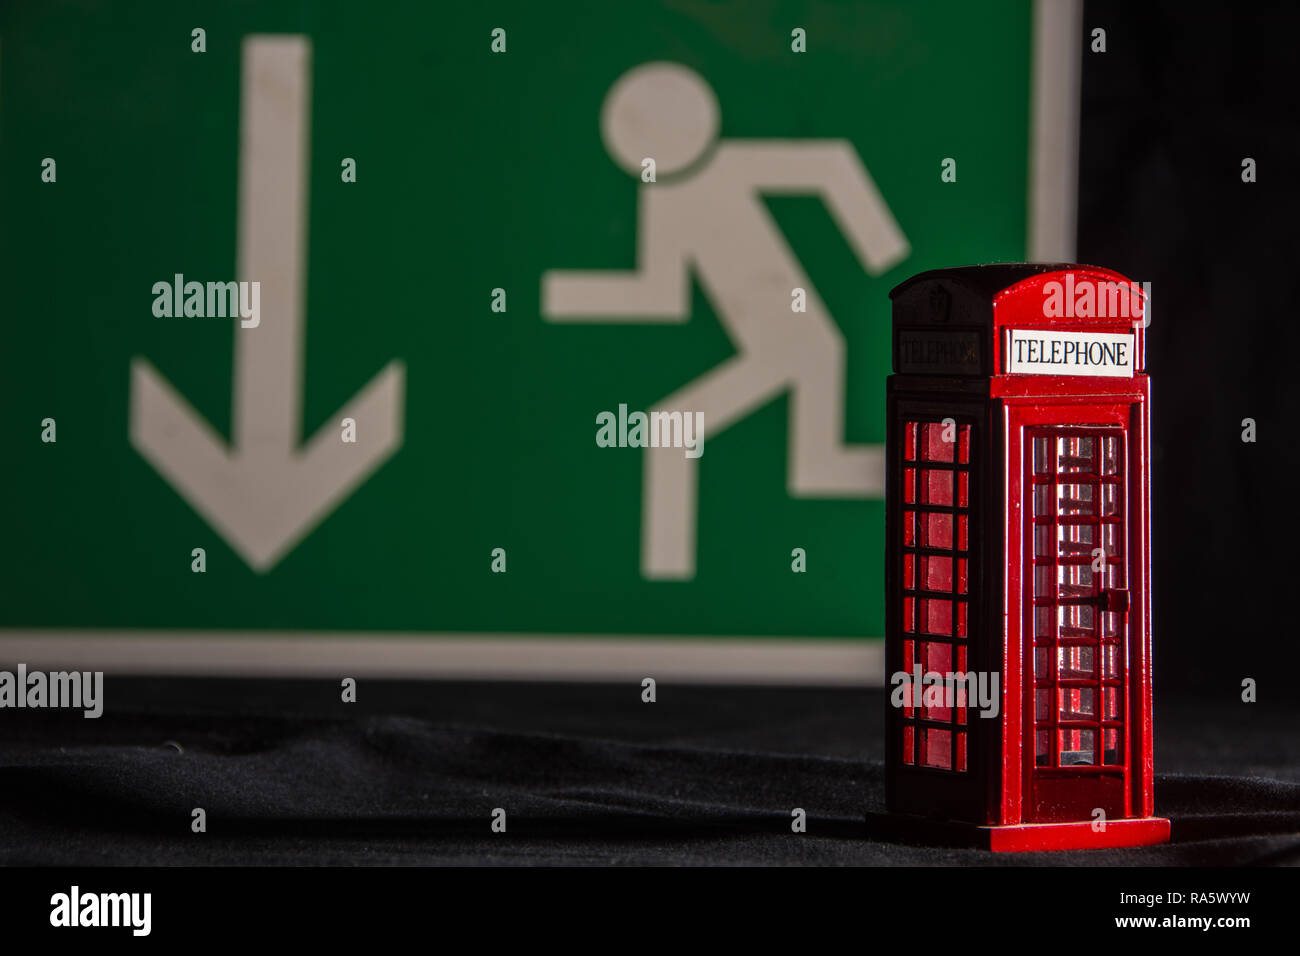 brexit concept - telephone kiosk - Stock Image